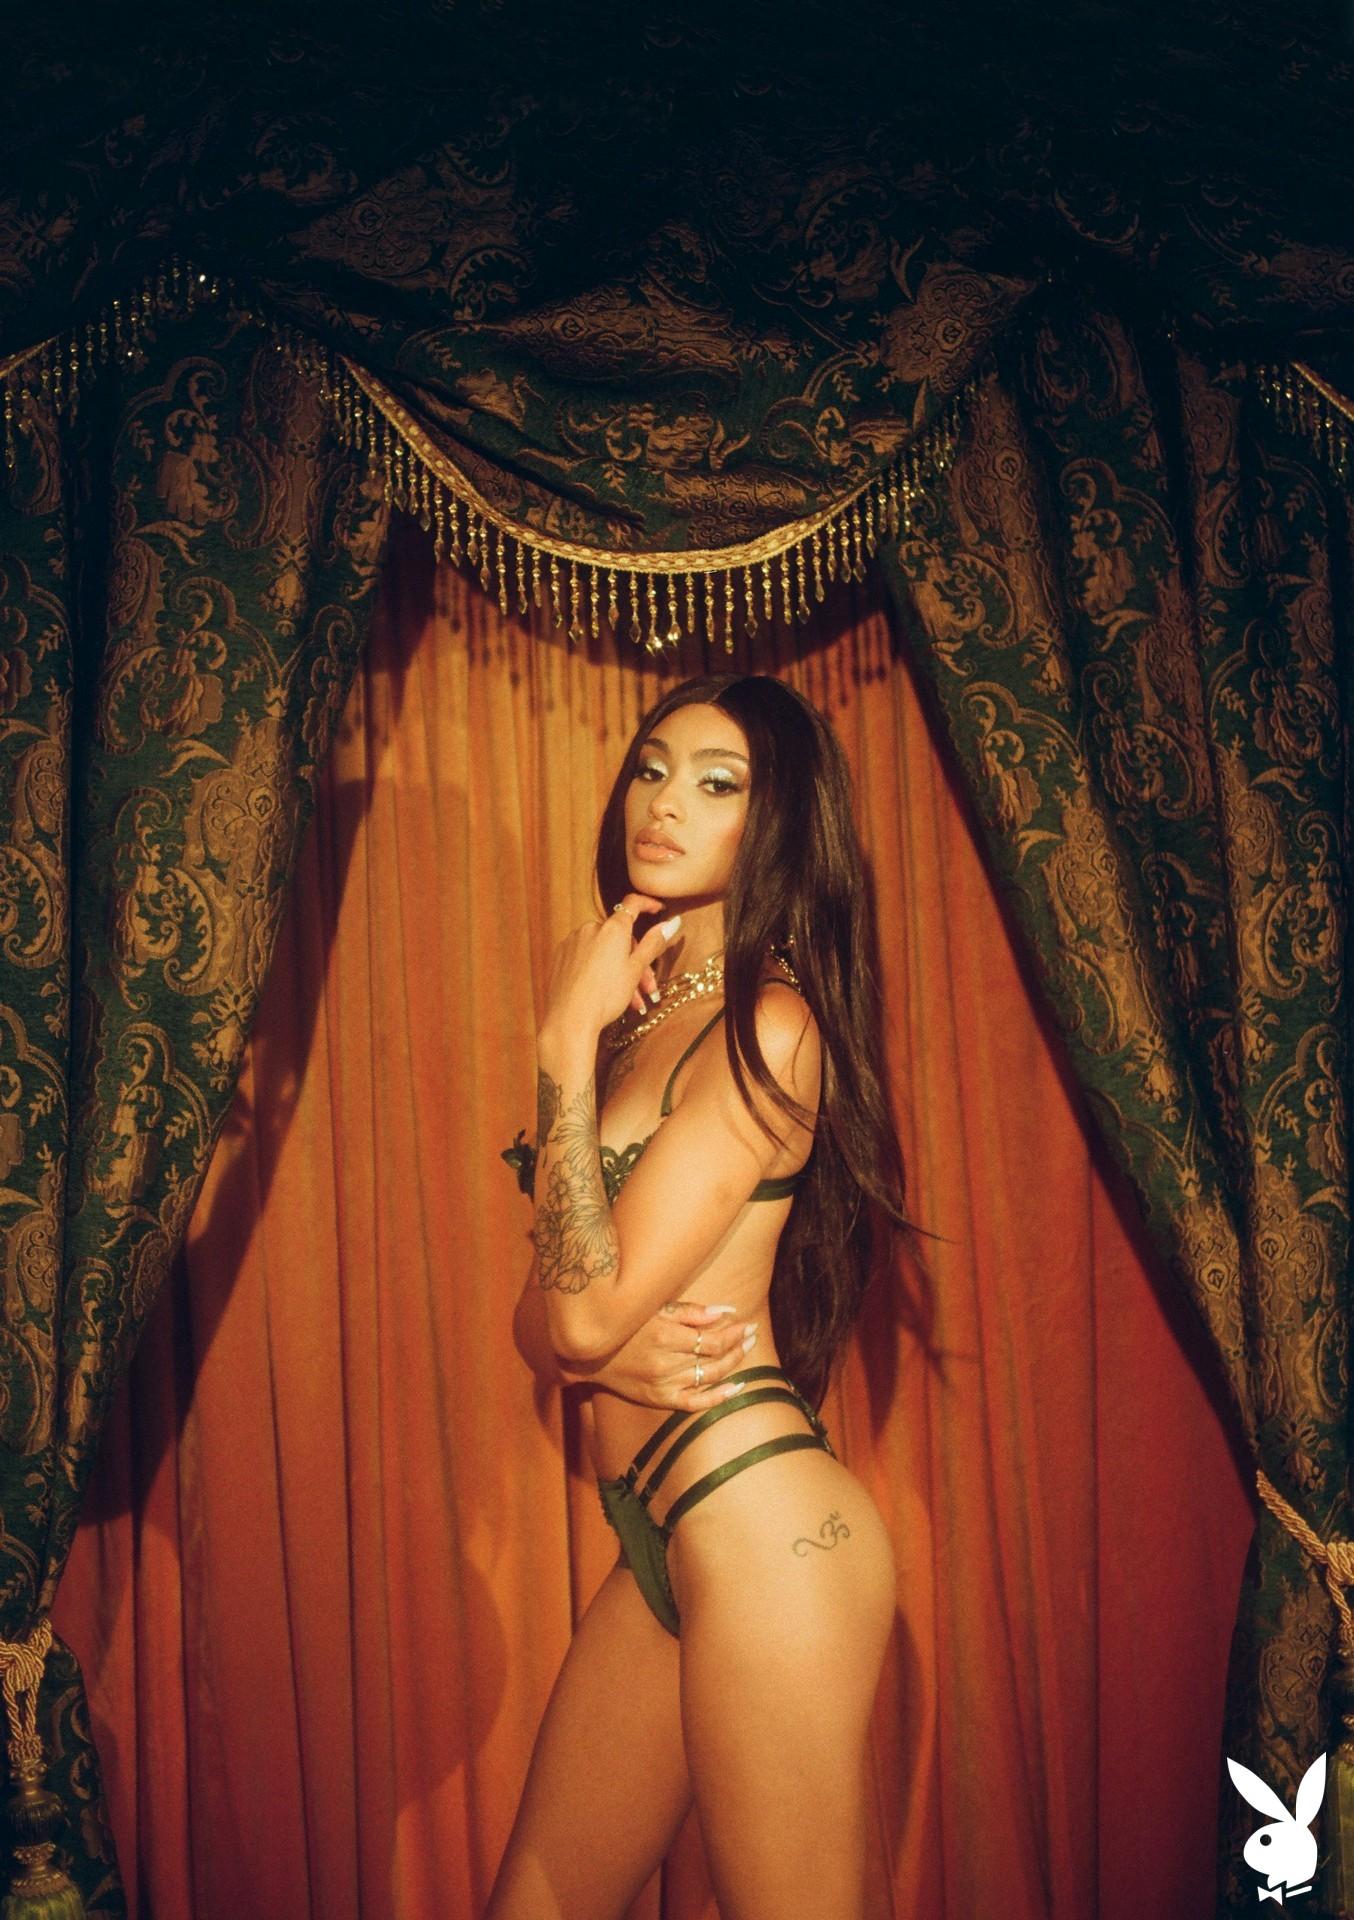 Sunni In Performance Art Playboy Plus (2)